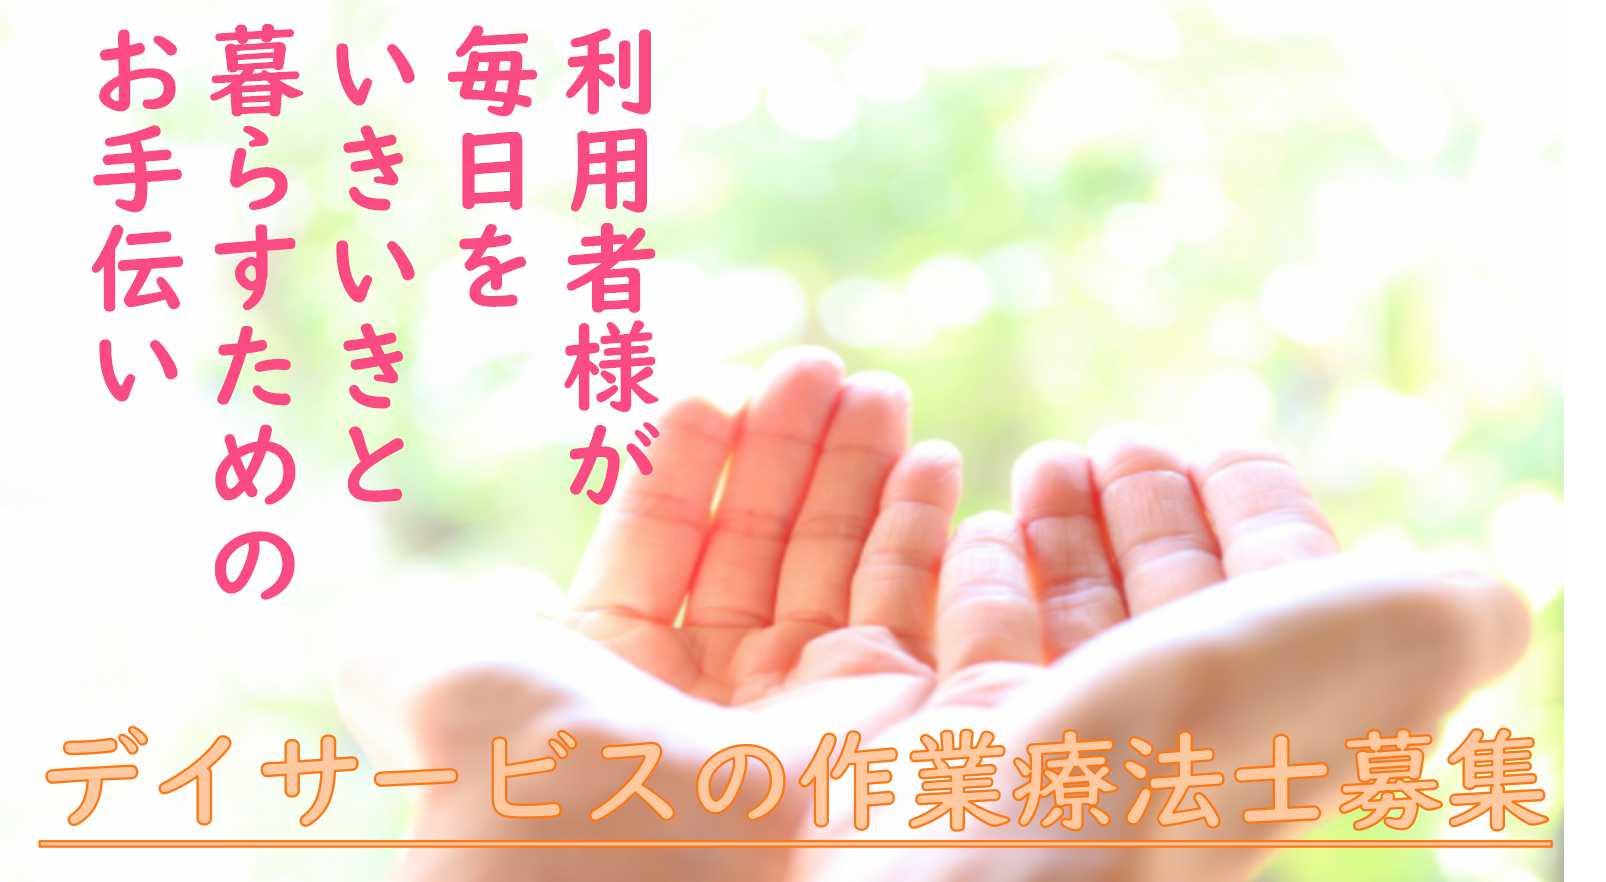 マイカー通勤OK♪月給26万円以上★作業療法士【即面談可能】 イメージ